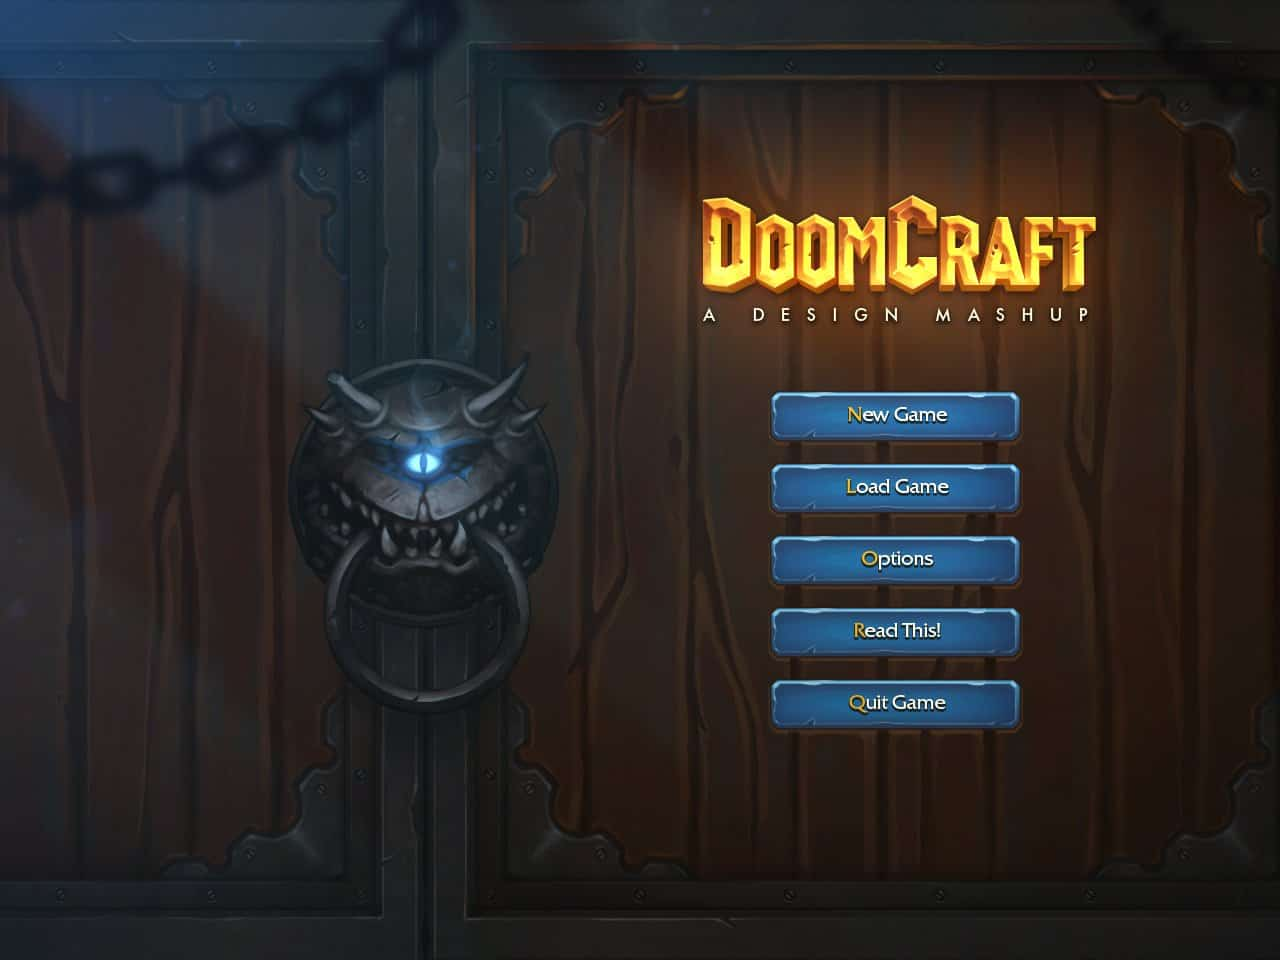 Warcraft Gets The Doom Treatment In DoomCraft: A Design Mashup 2